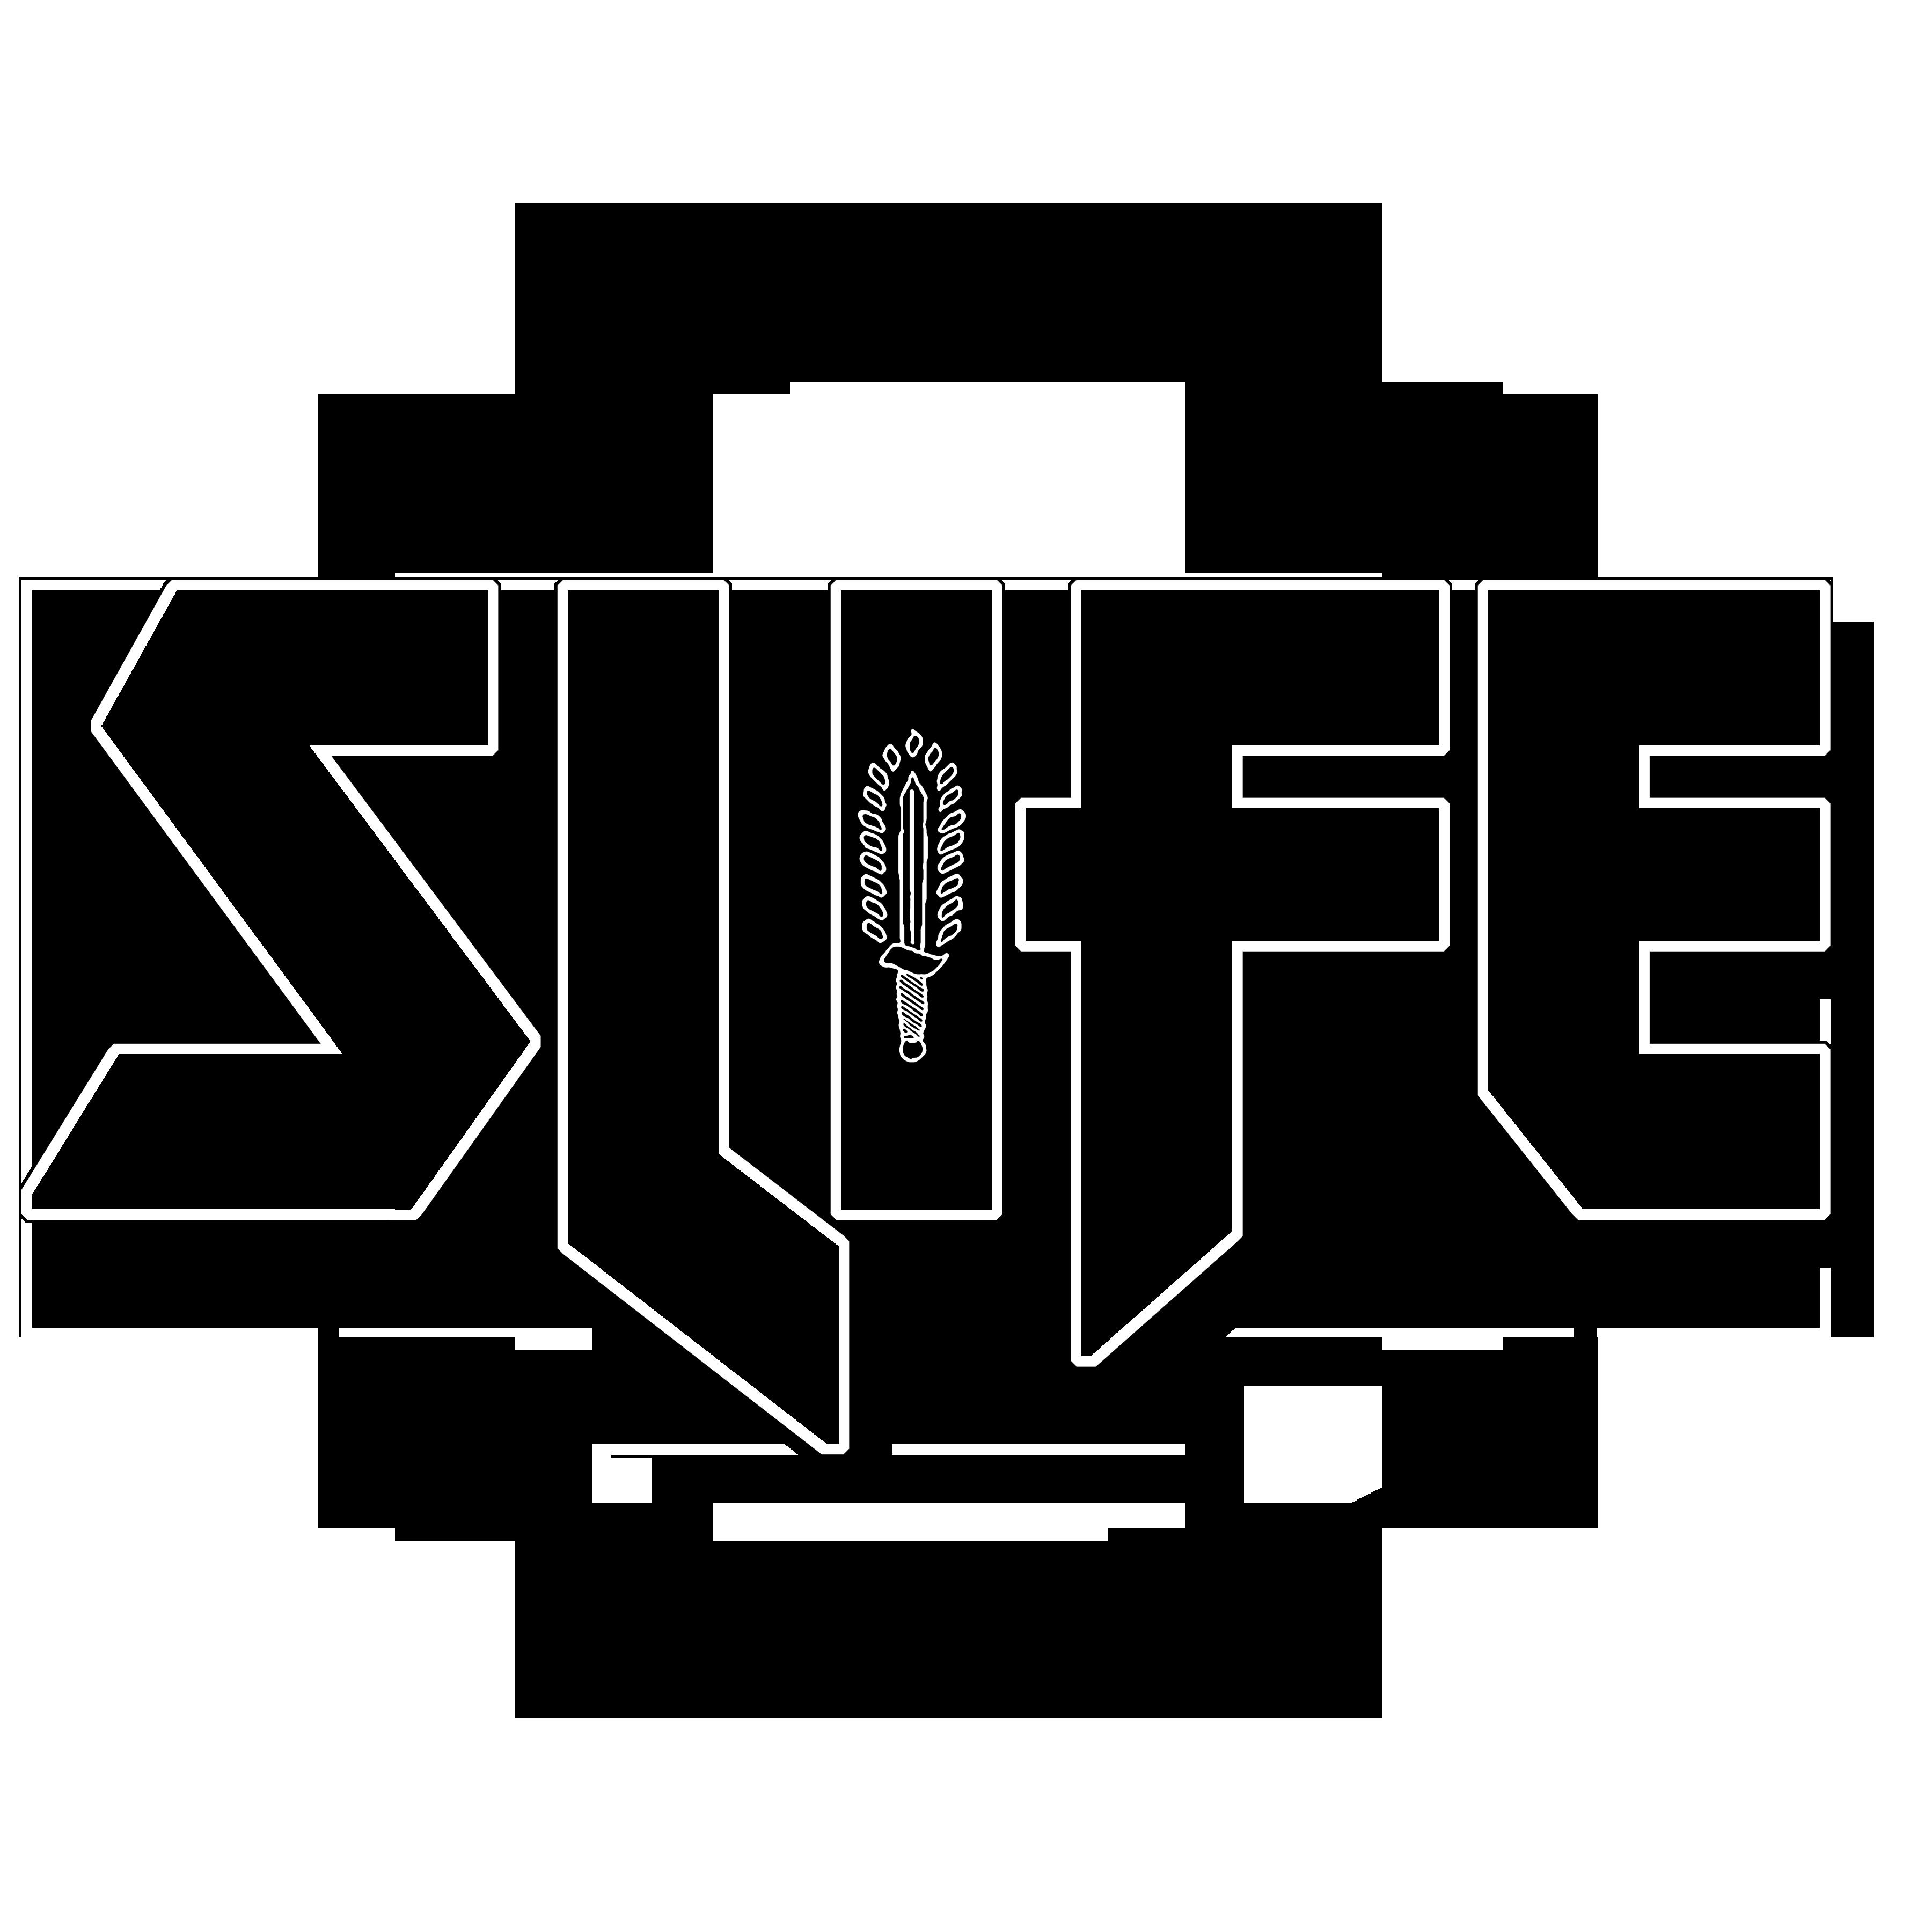 slife-blackfont